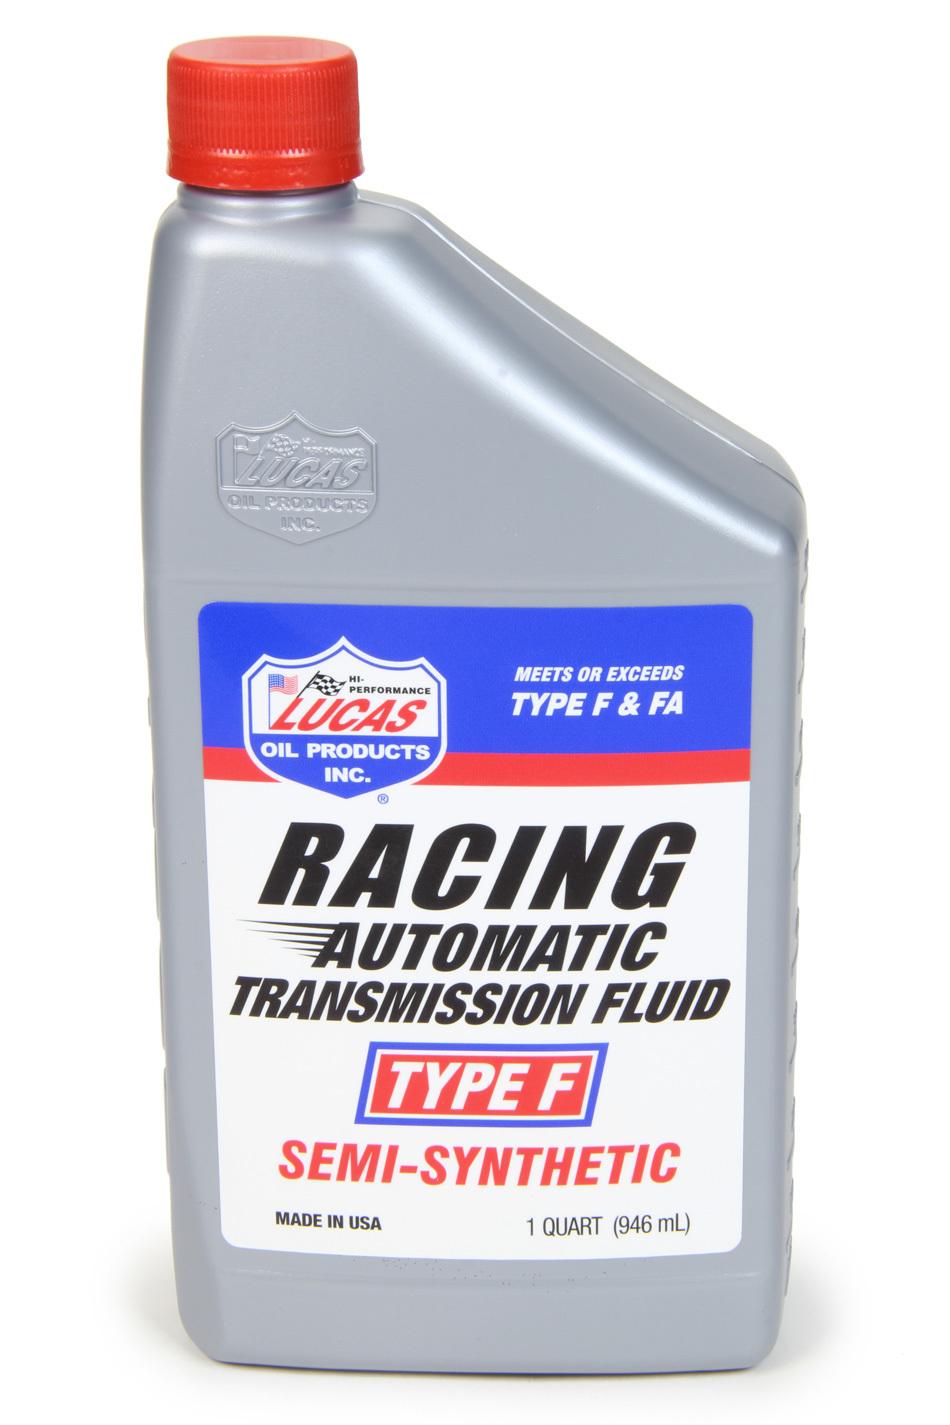 Lucas Oil Type F Racing Transmissi on Fluid 1 Quart